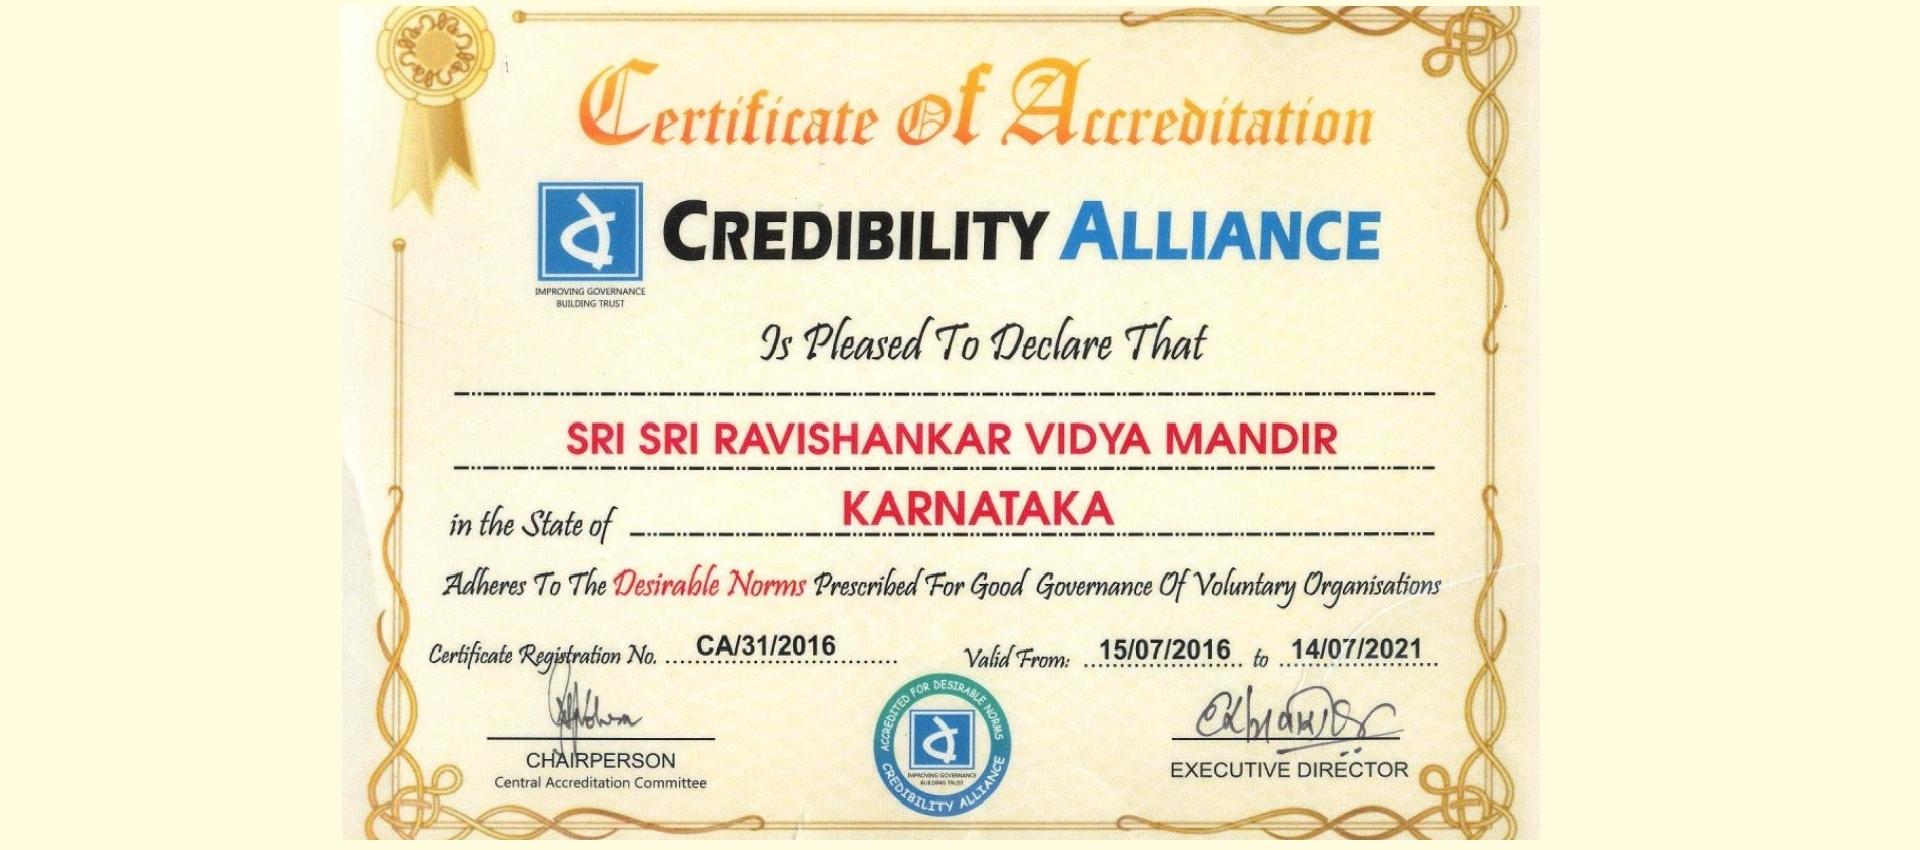 Certificate sri sri ravishankar vidya mandir trust certificate 1betcityfo Images